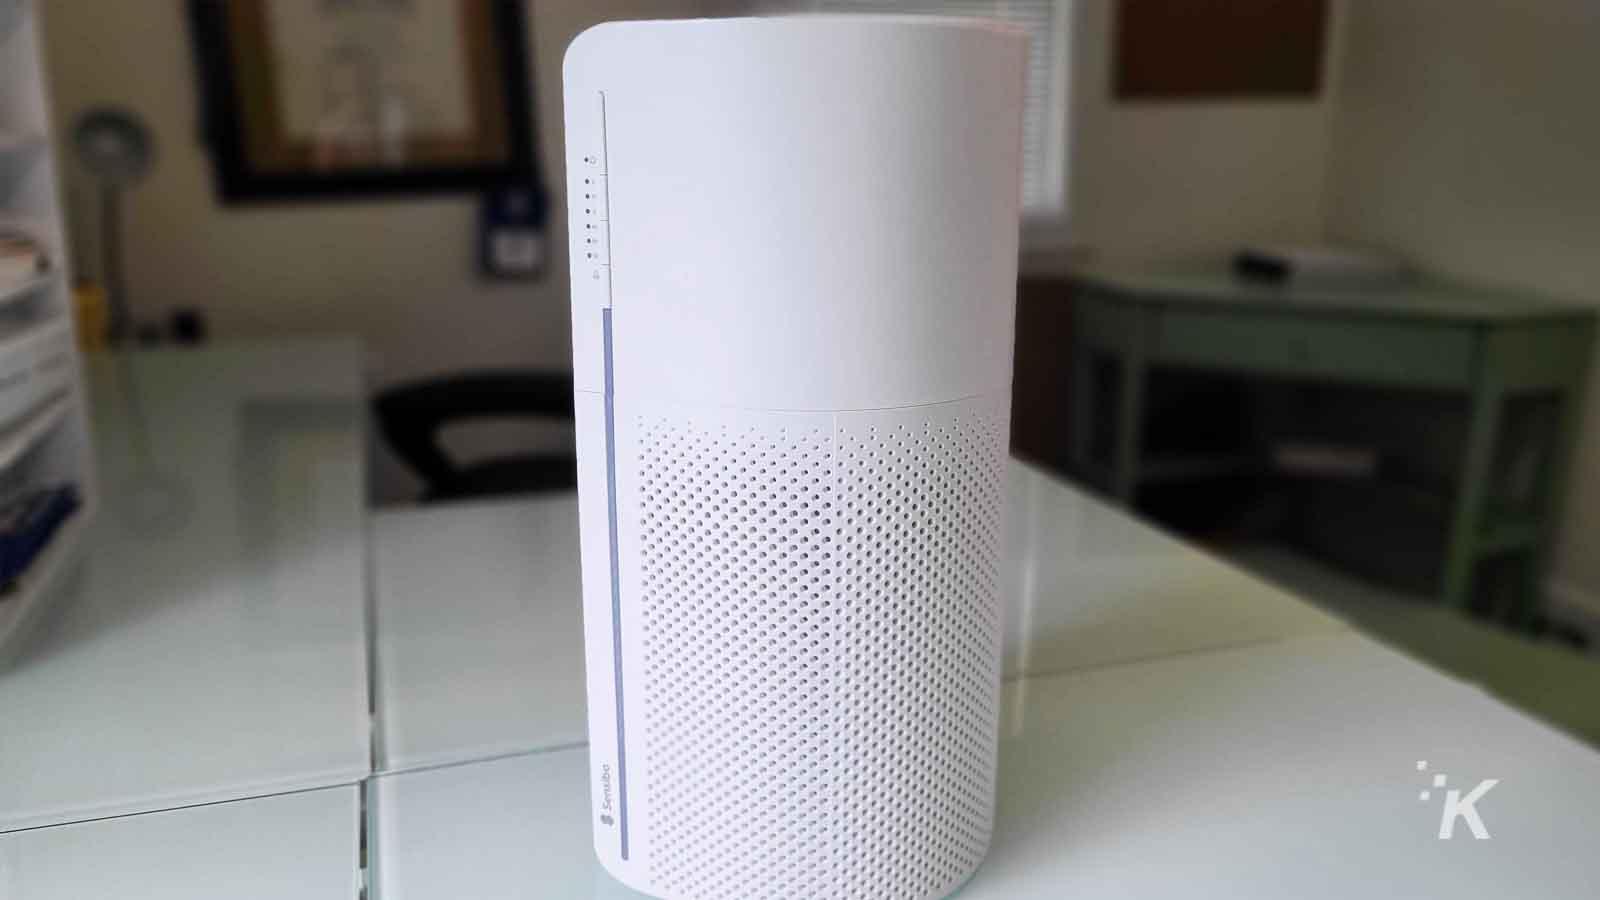 sensibo air purifier on table